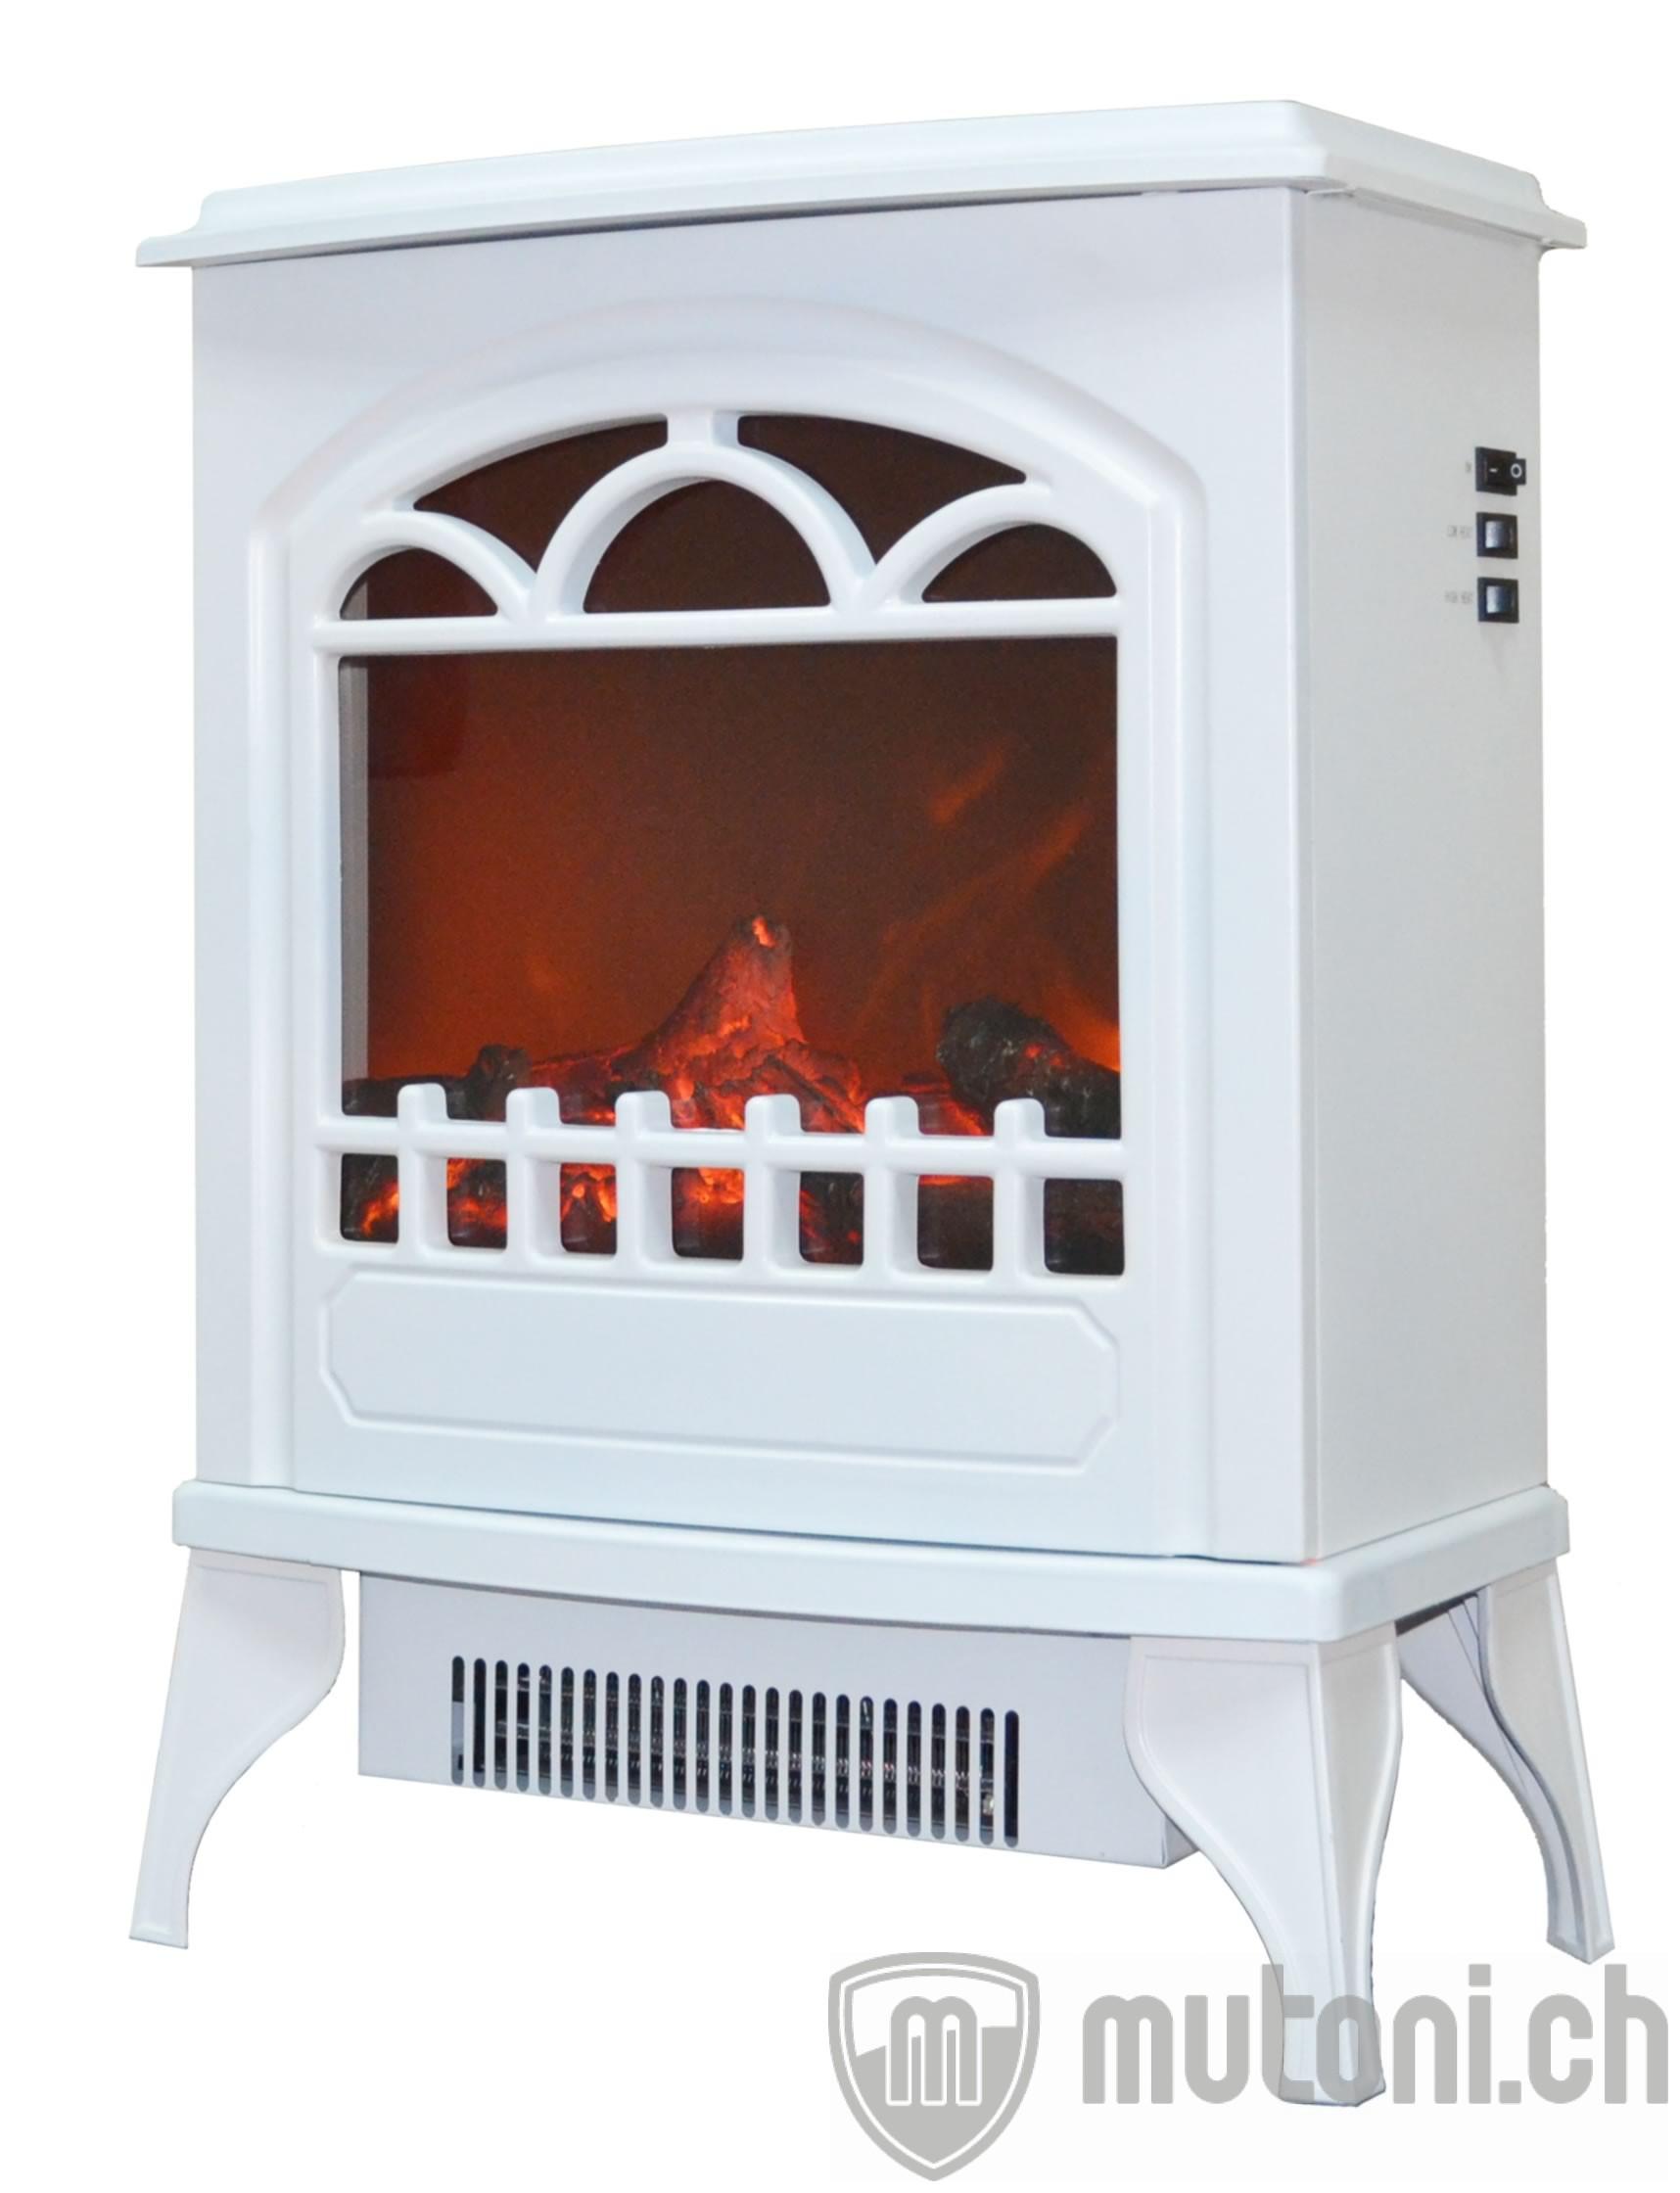 elektrokamin chalet 42x57 weiss mutoni design mutoni m bel. Black Bedroom Furniture Sets. Home Design Ideas